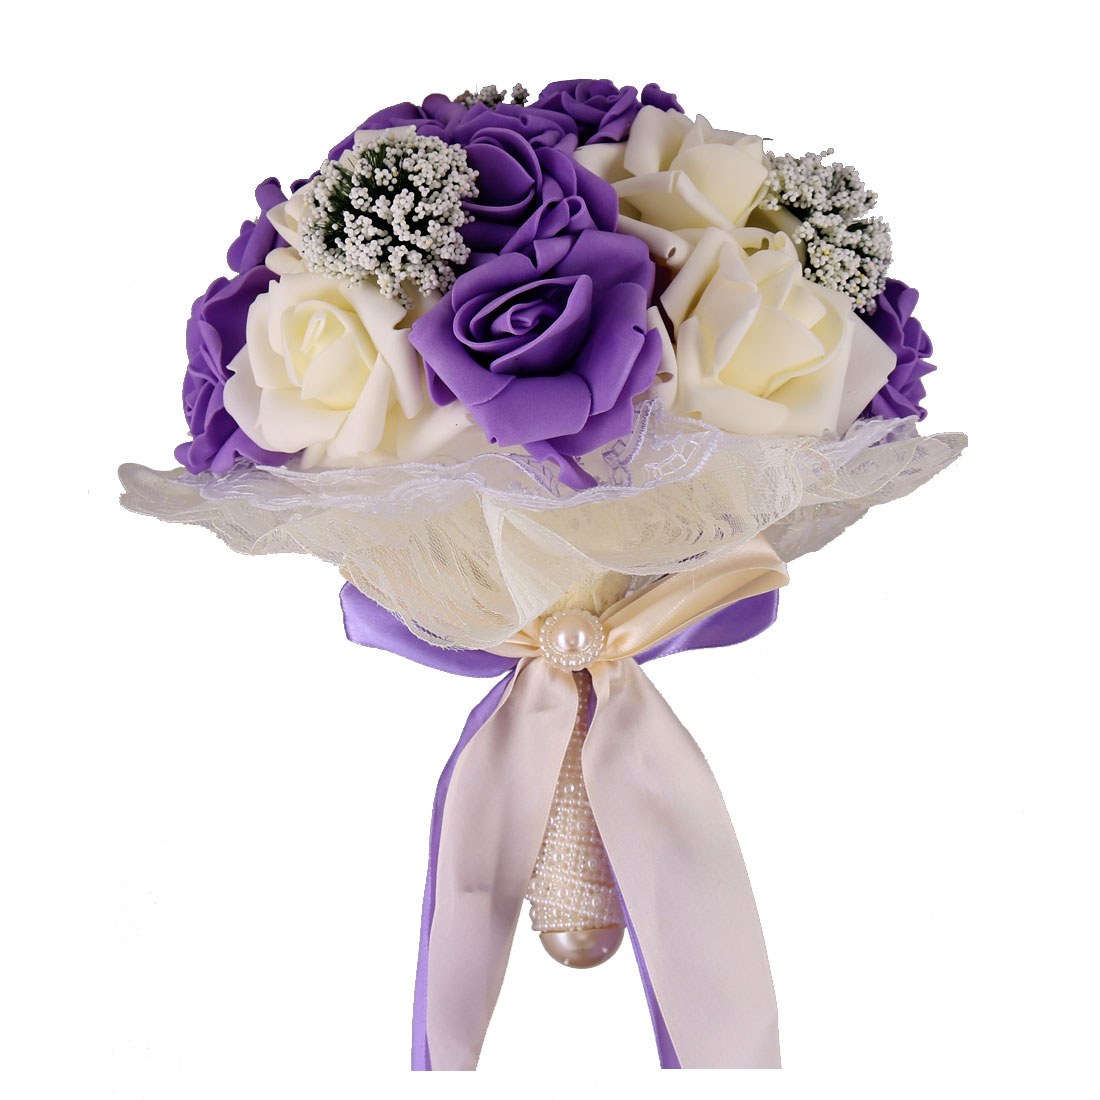 Wedding Foam Bowknot Decor Rose Handhold Bouquet Purple Light Yellow 9 Inch Dia